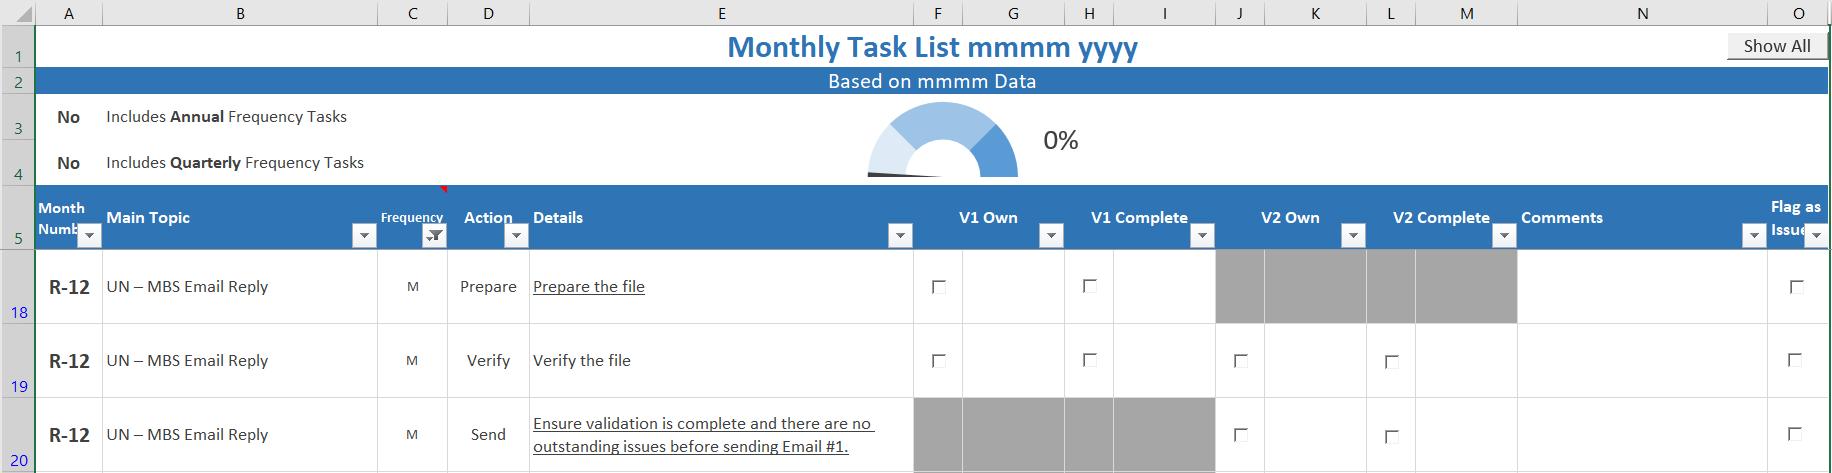 task_list_screenshot.png